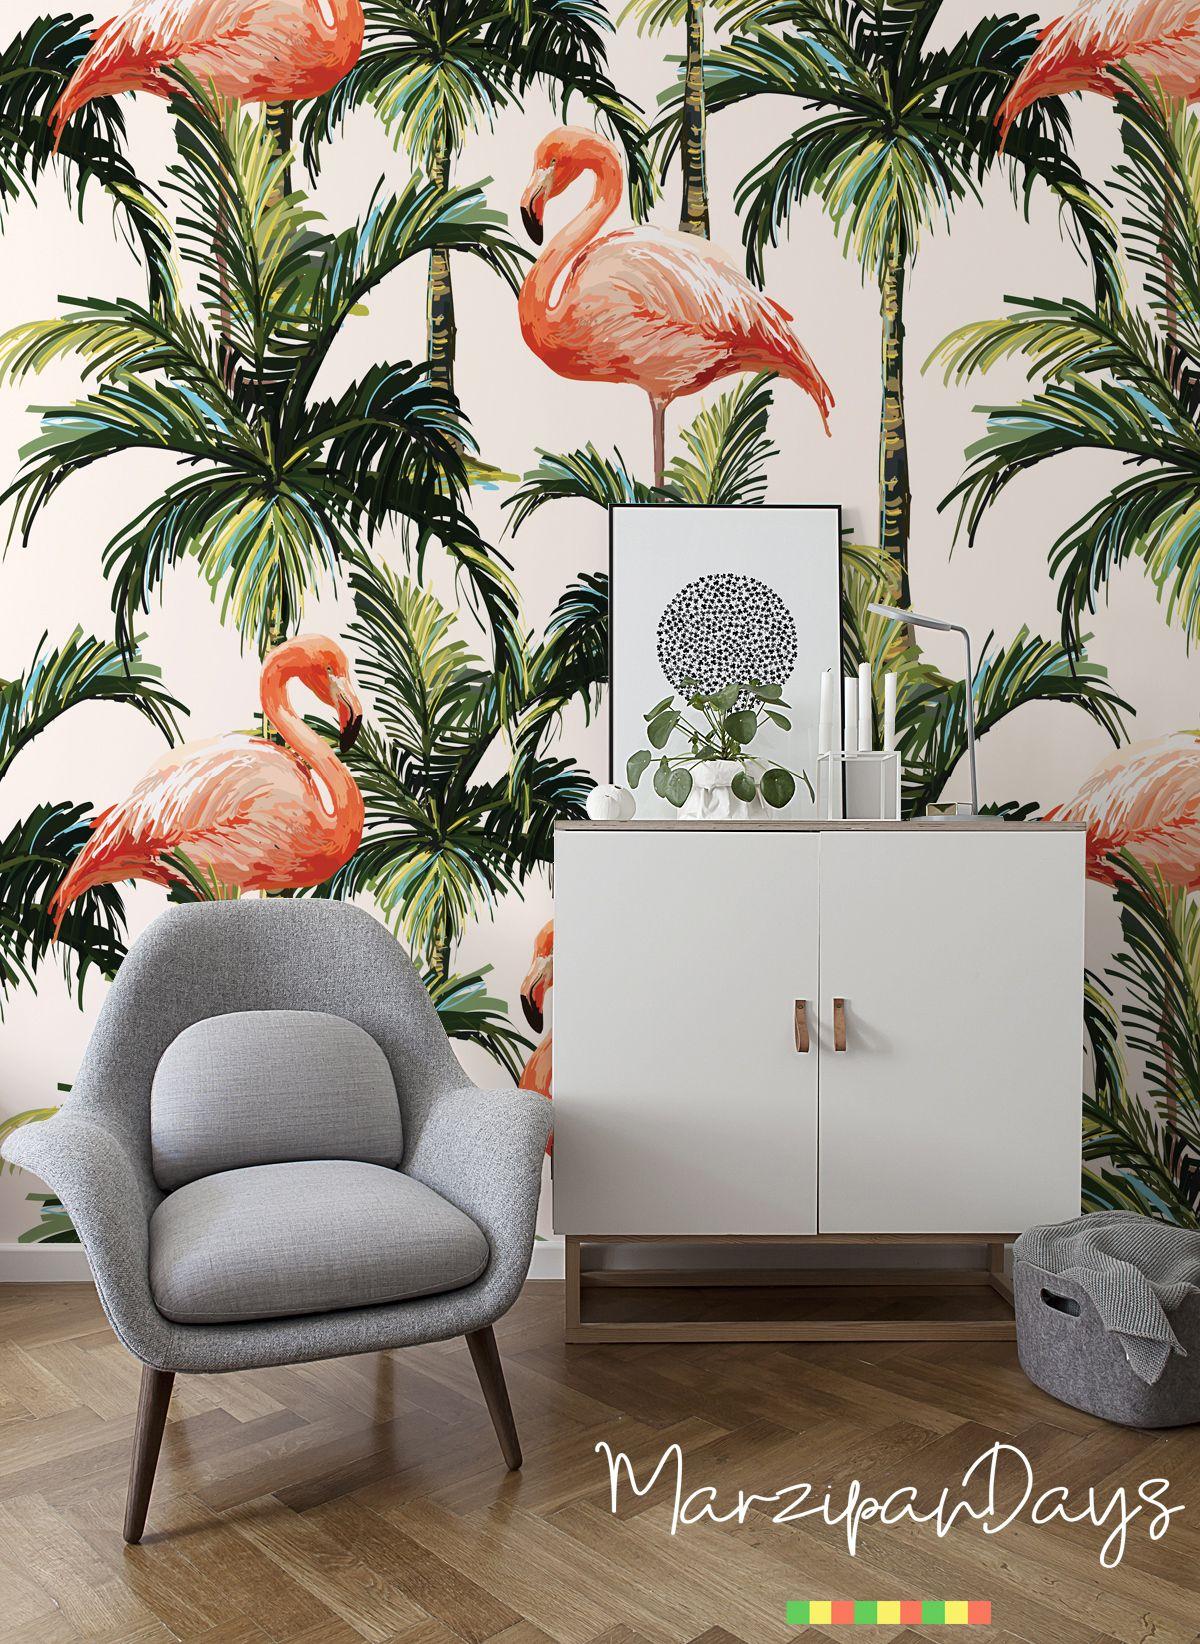 Flamingo Wallpaper Tropical Wall Mural Palm Wall Decor Etsy Flamingo Wallpaper Tropical Home Decor Wall Murals